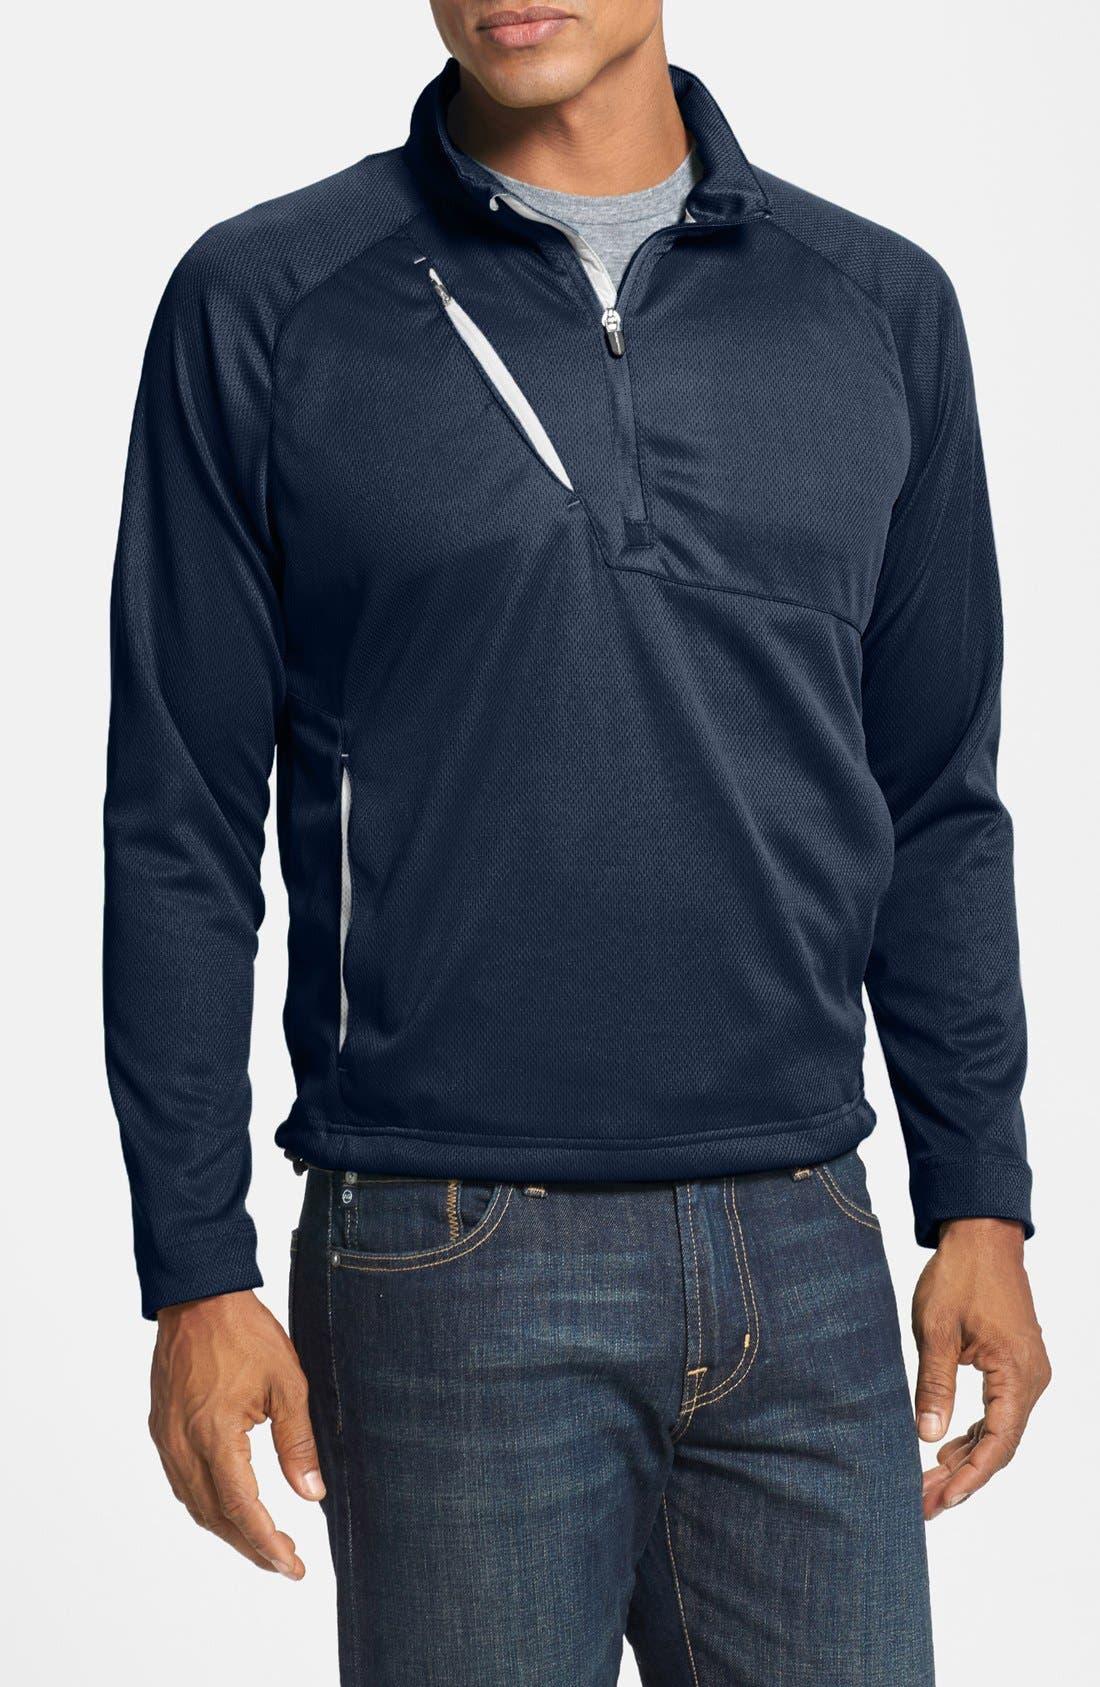 Main Image - Zero Restriction 'Wedge' Quarter Zip Pullover